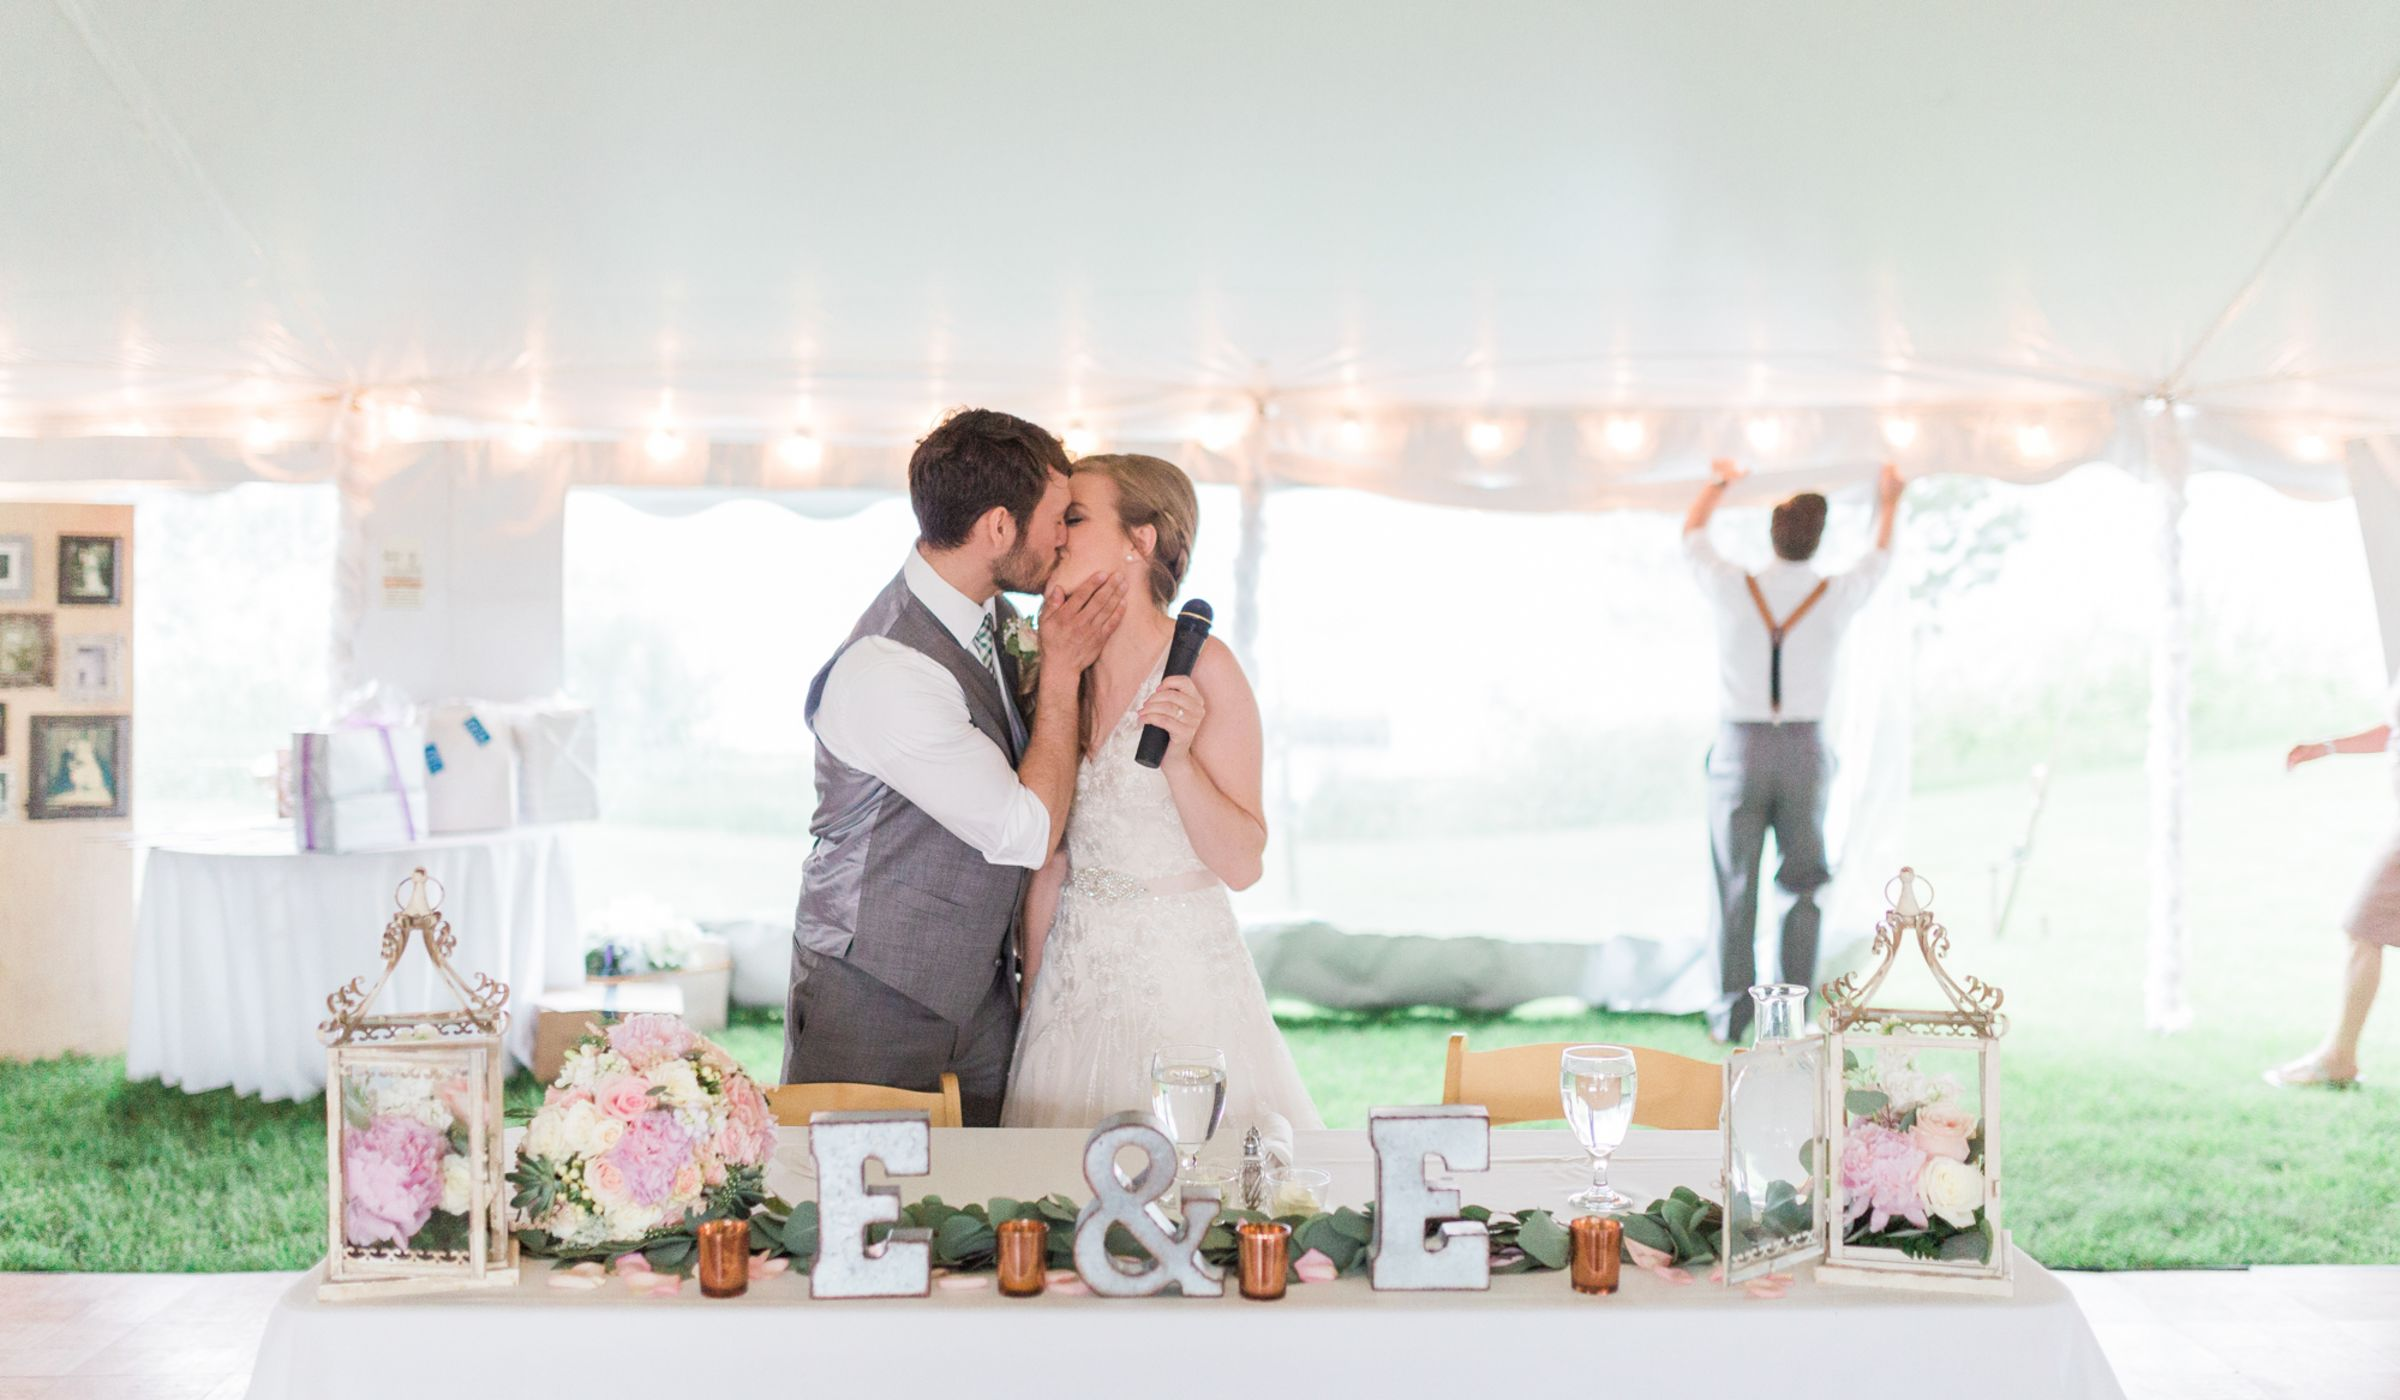 Your Own Wedding Thank You Speech